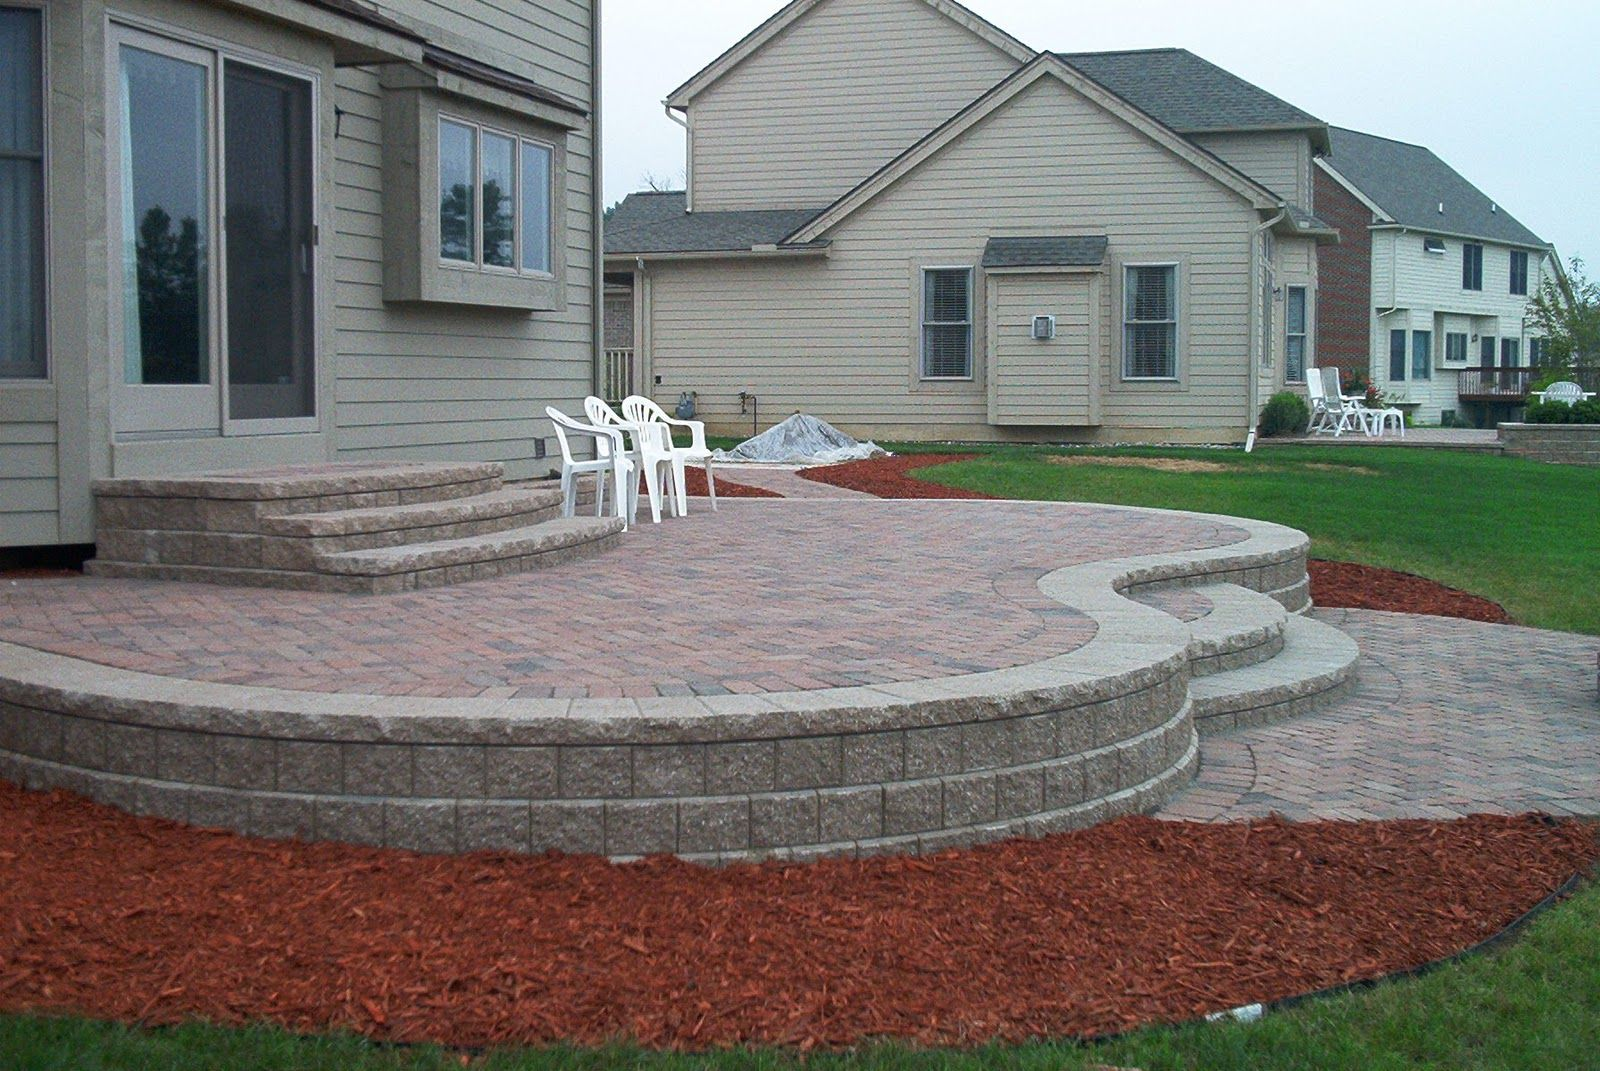 Brick Patio Ideas For Small Backyards | Paver Patio Installations ...